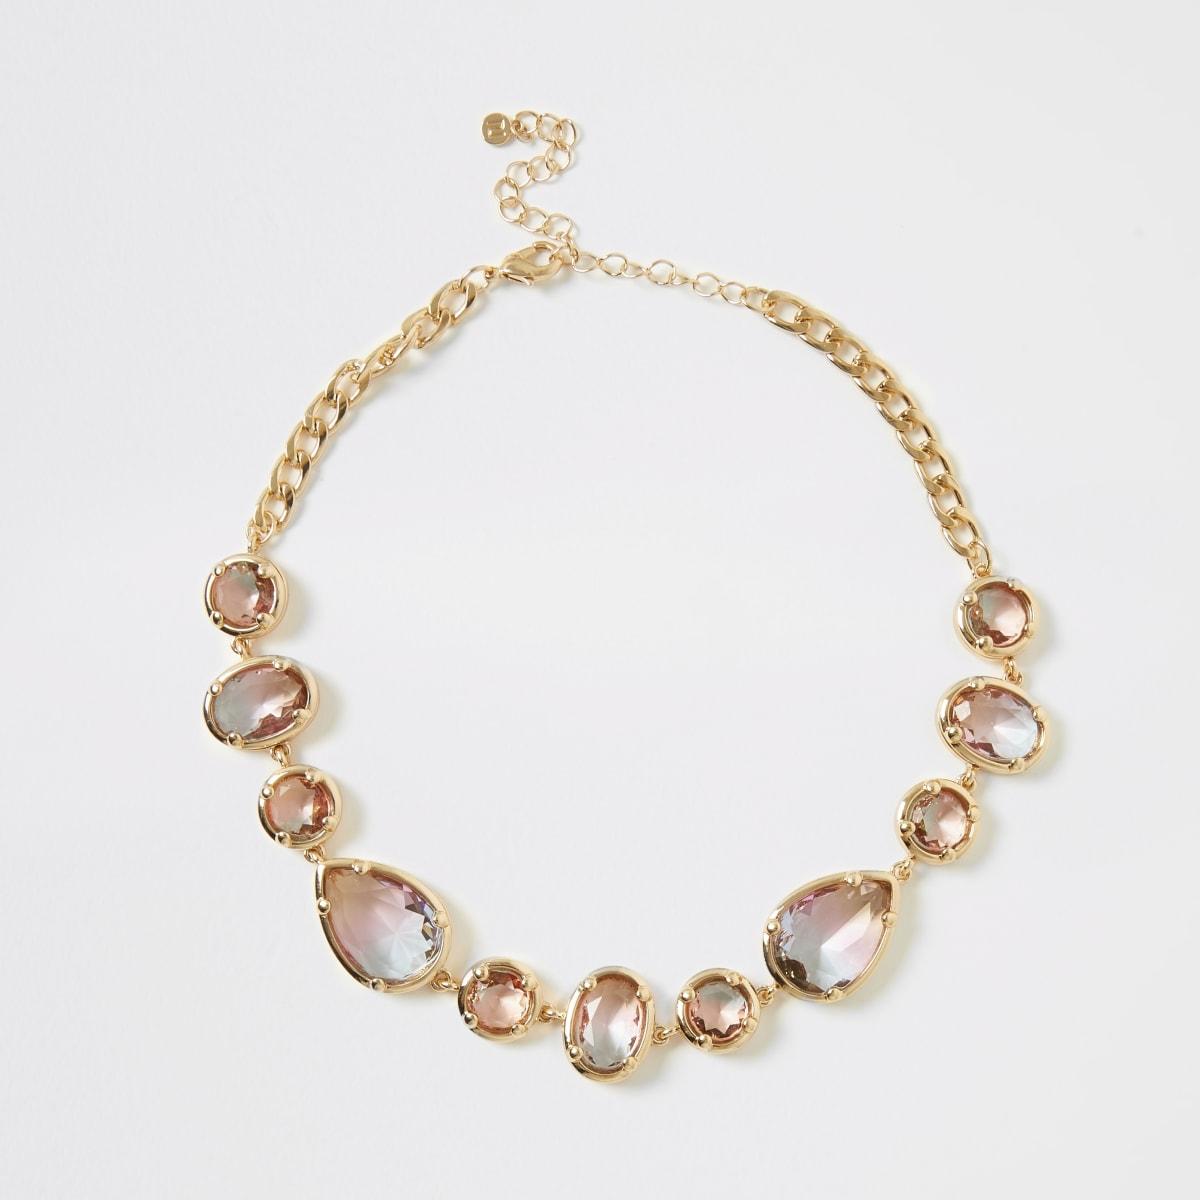 Pink ombre jewel embellished necklace